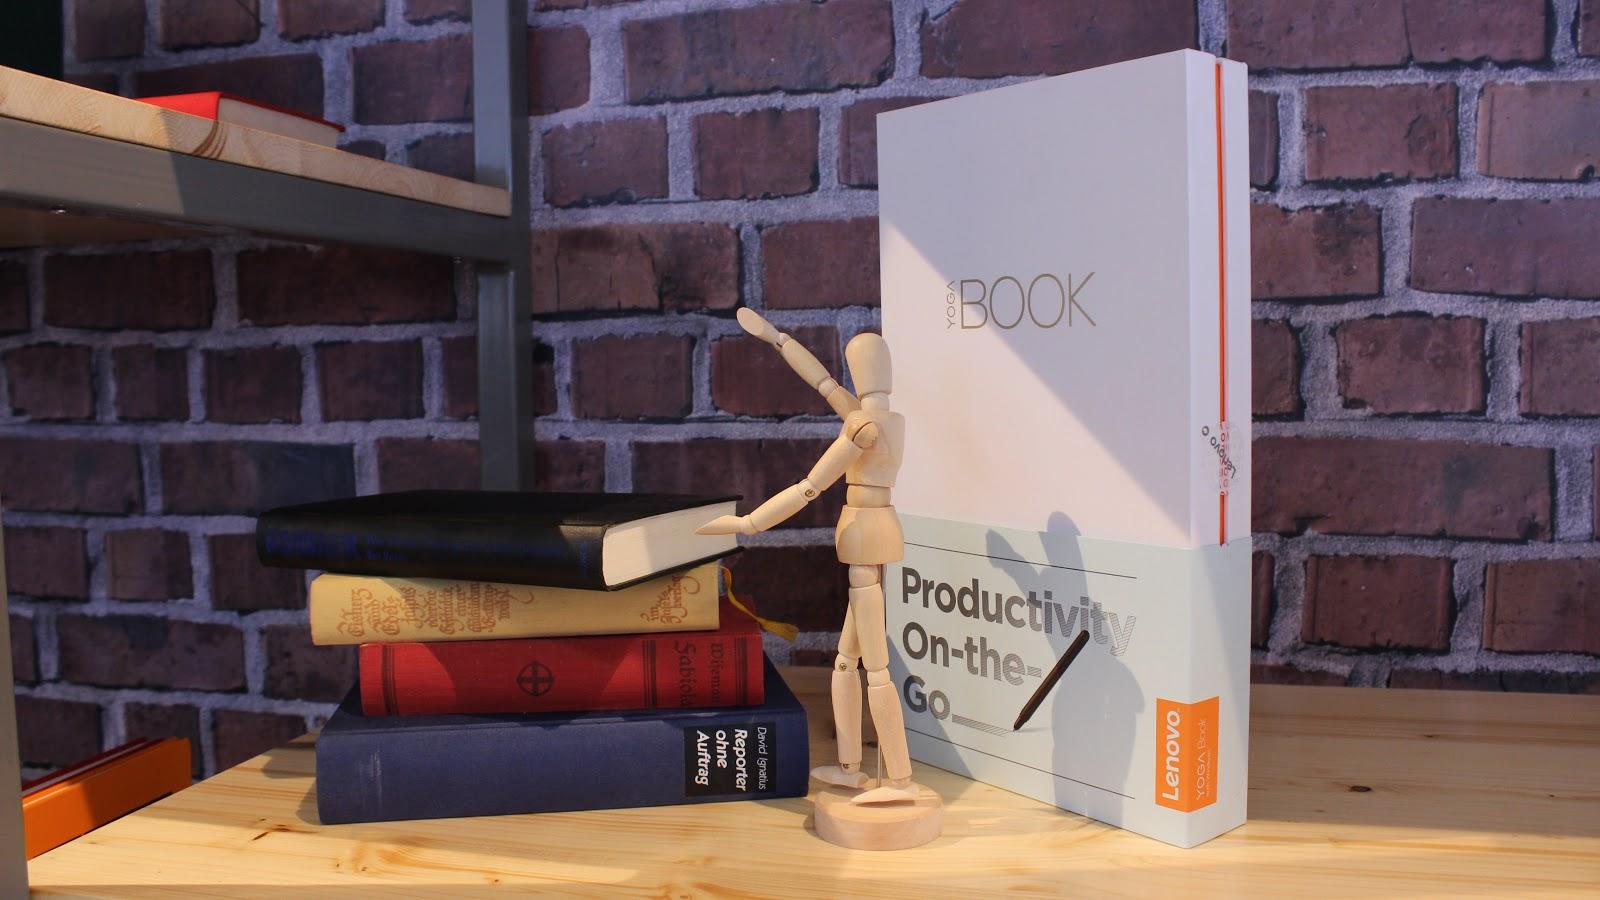 Гвоздь программы: Lenovo YOGA Book на IFA 2016 - 6